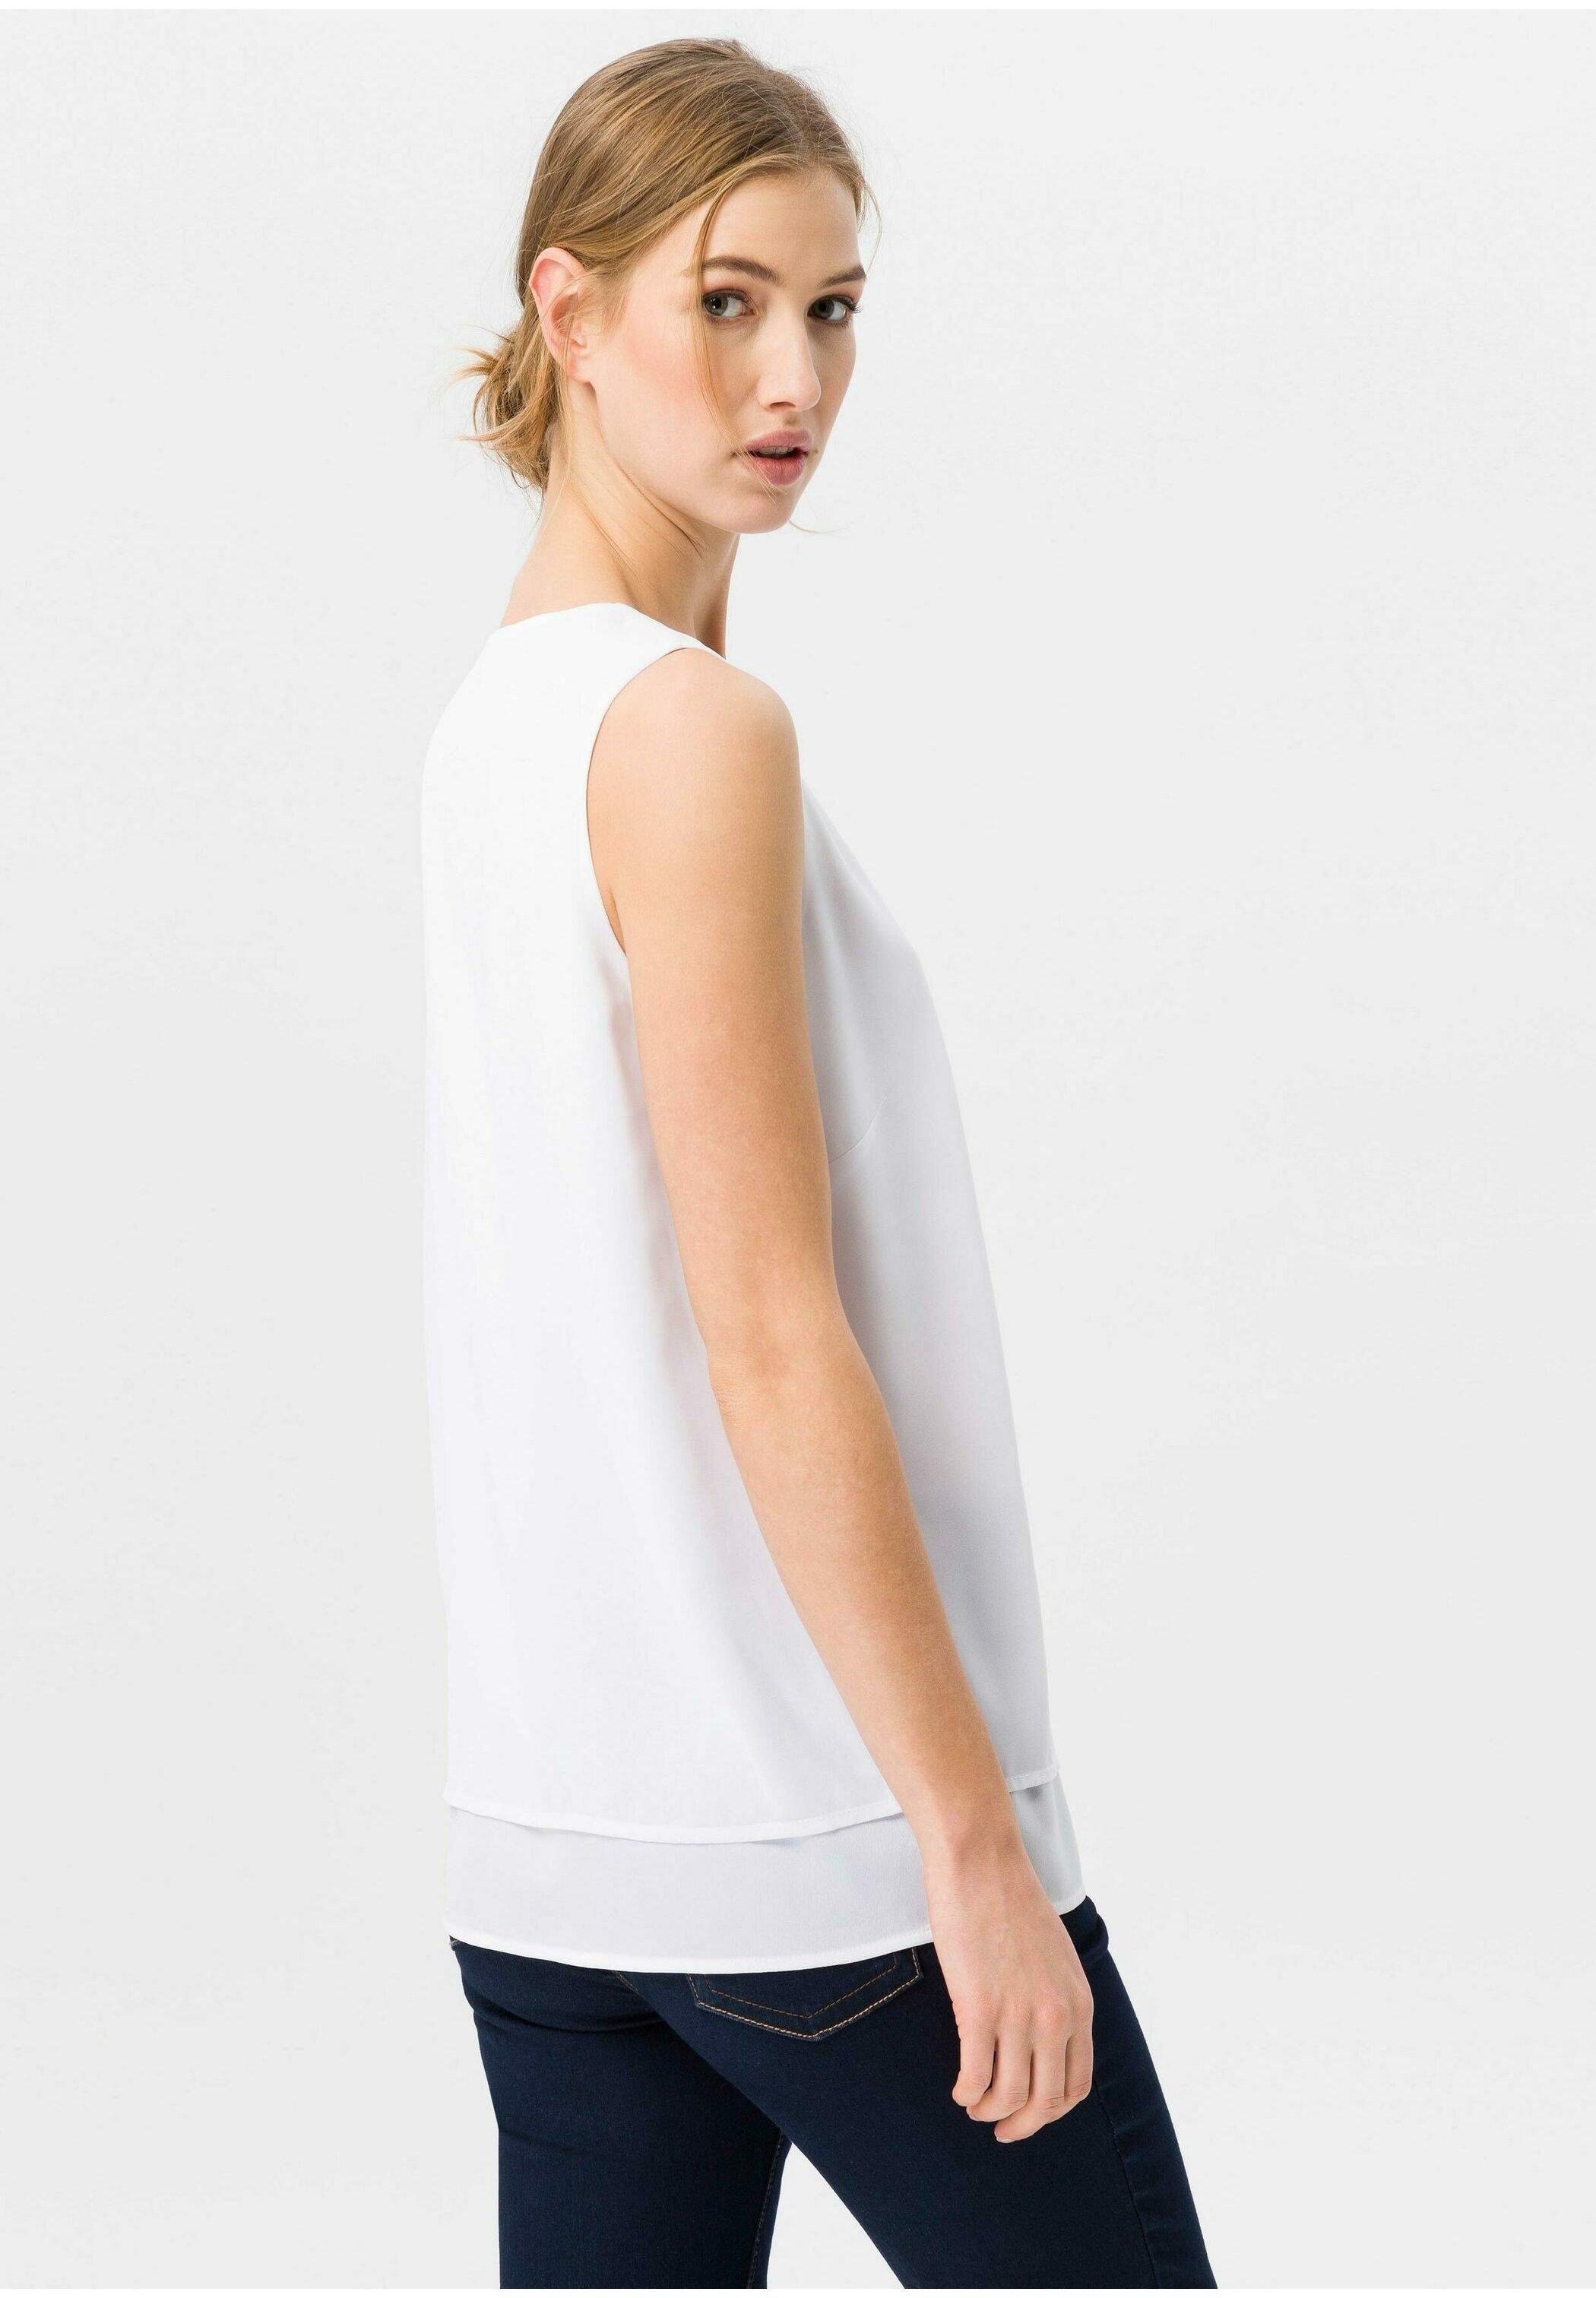 Uta Raasch Bluse - Blouse Weiß